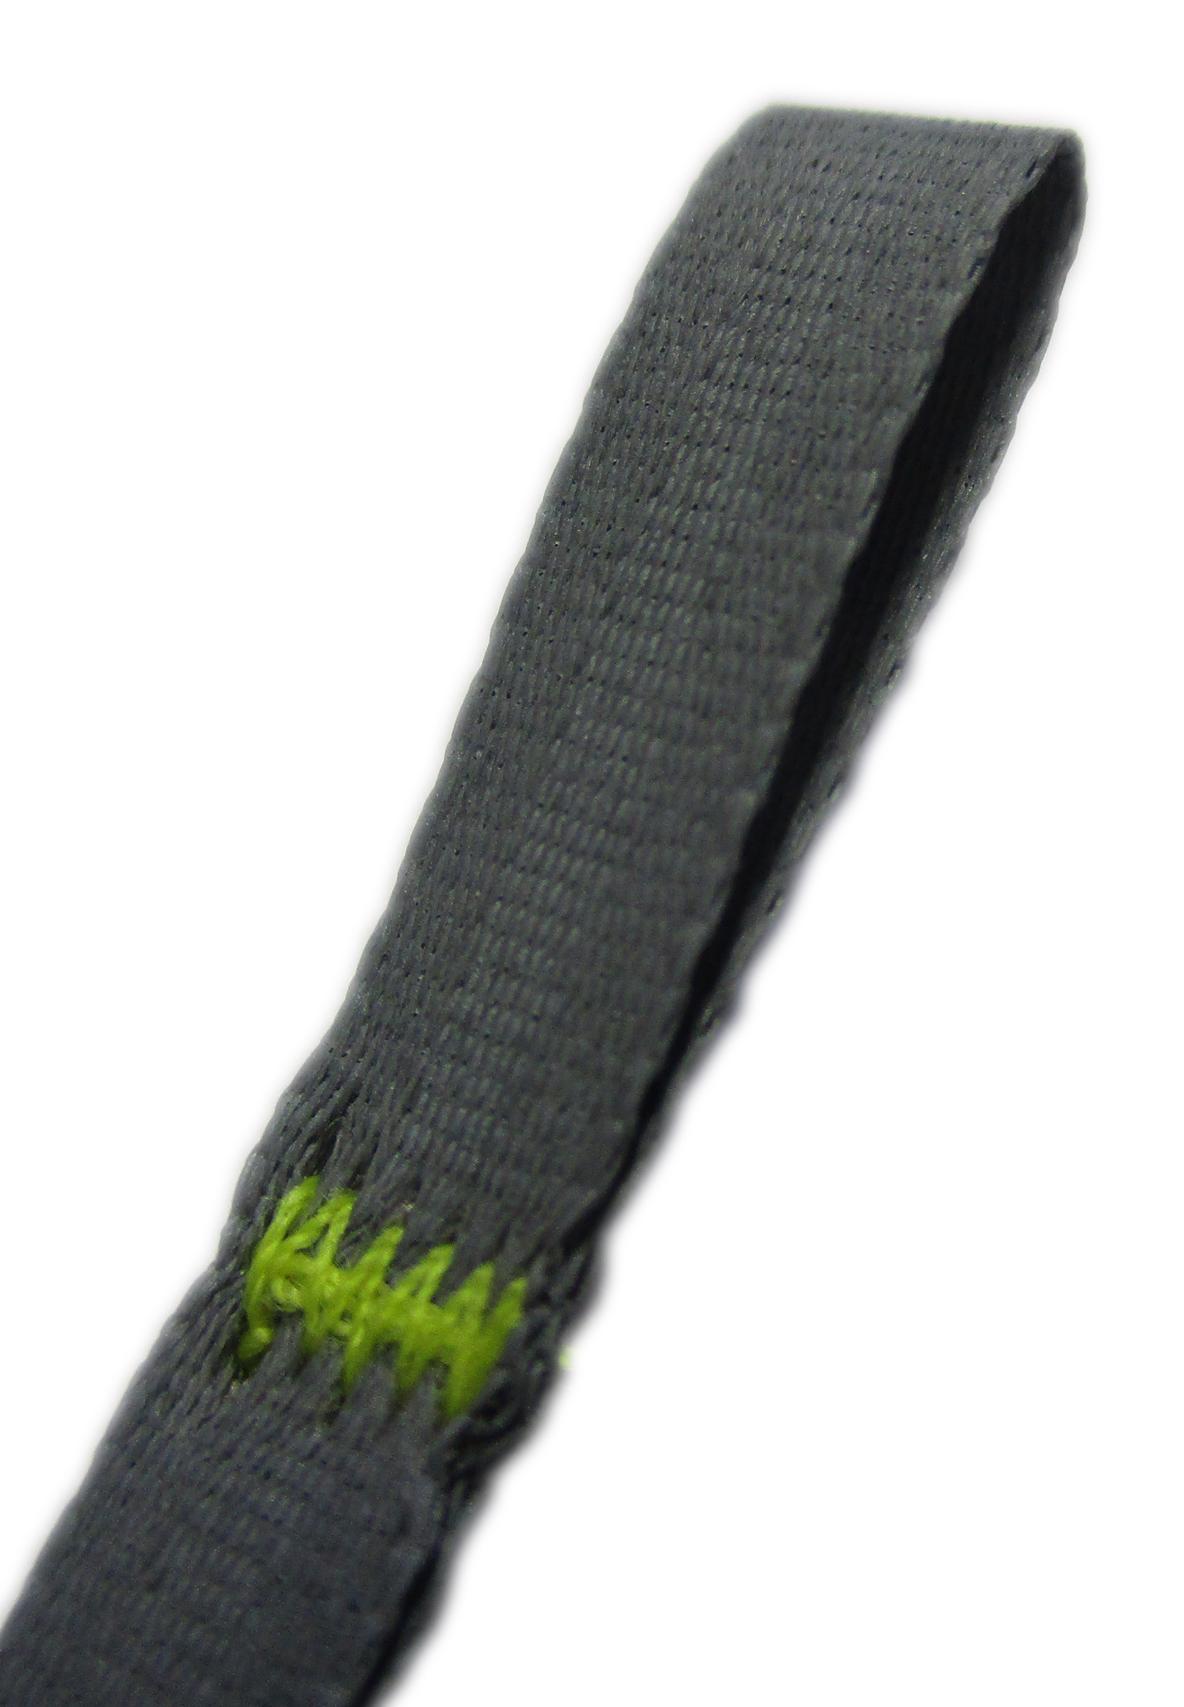 Texband-Schlaufeso7dLvIitfZ05